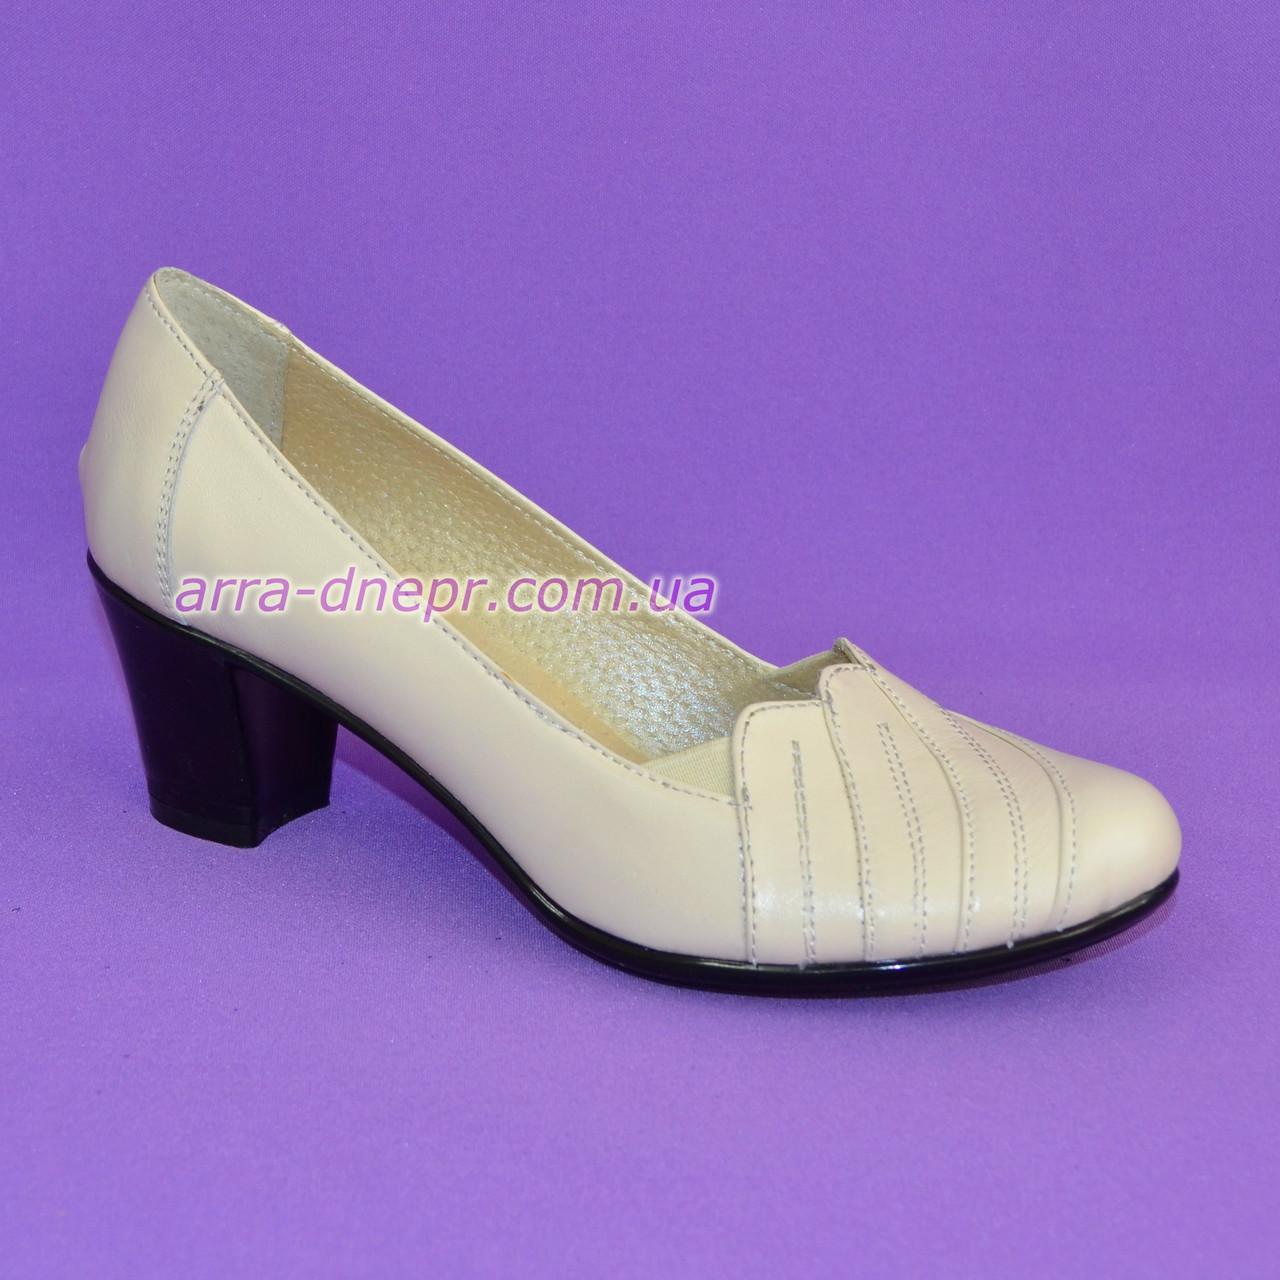 "Бежевые туфли женские, из натуральной кожи, на устойчивом каблуке. ТМ ""Maestro"""